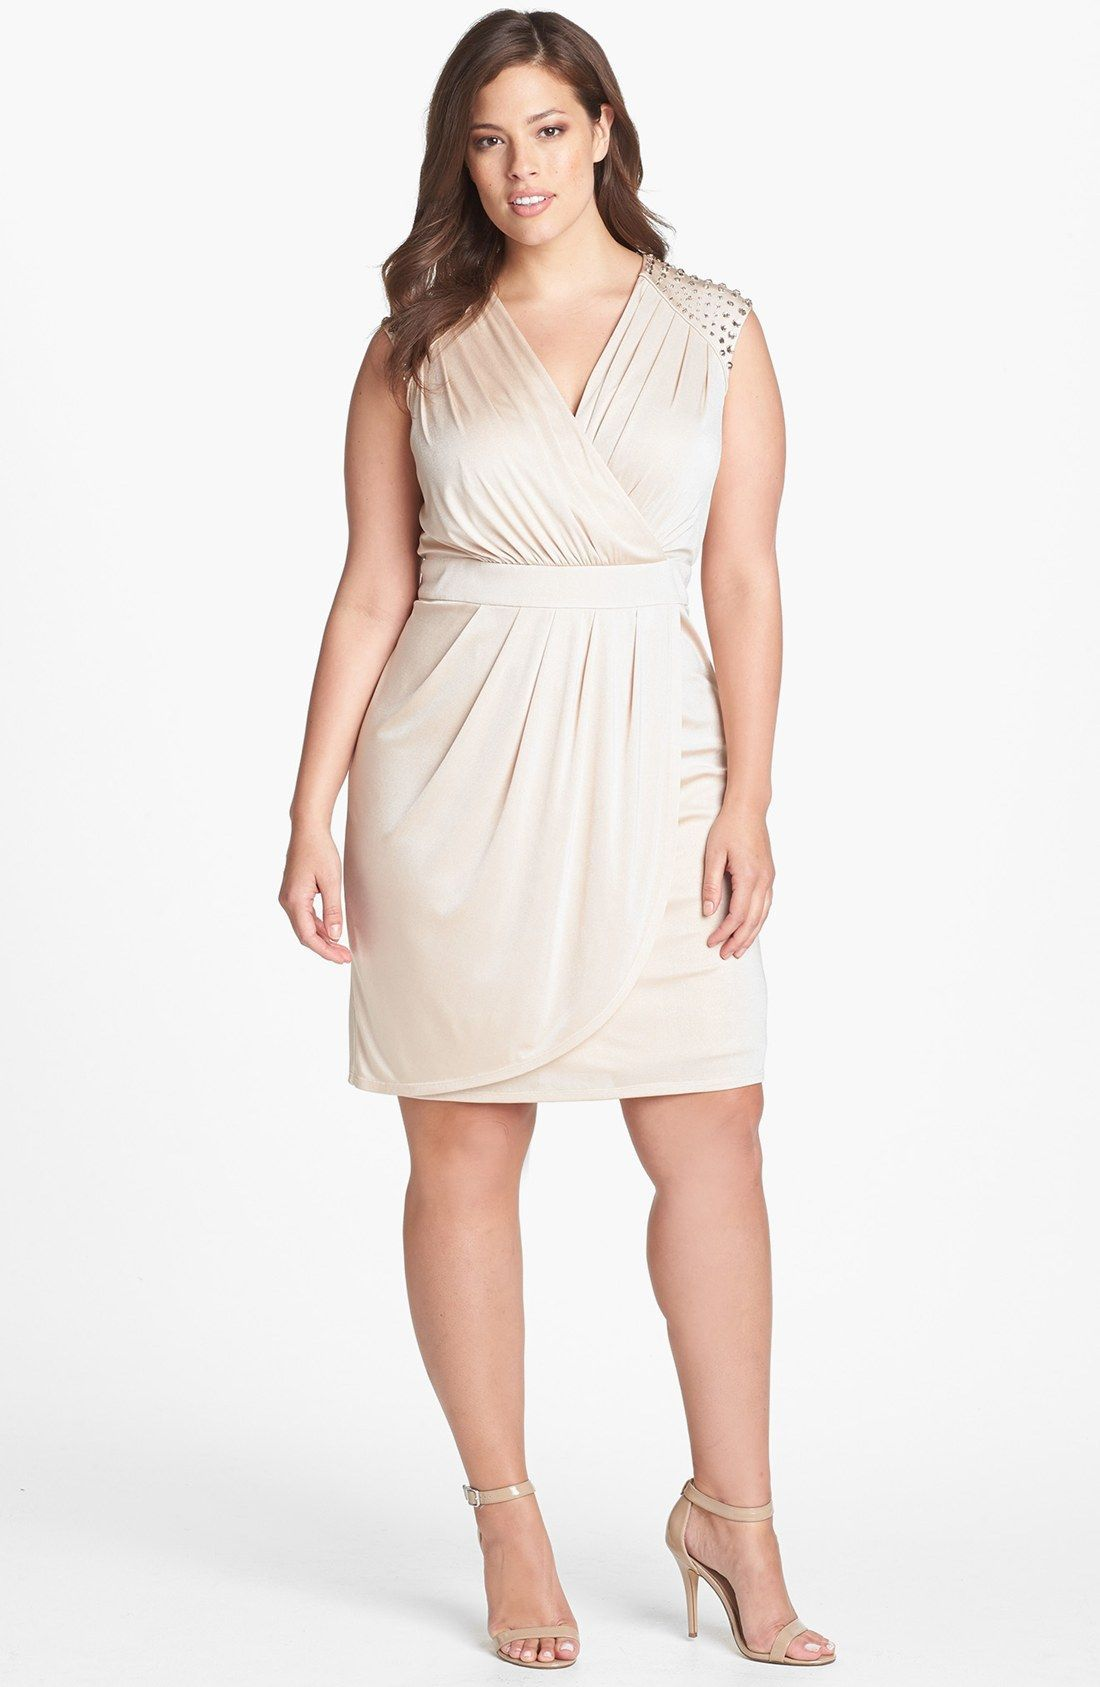 Vince Camuto Embellished Faux Wrap Dress #PlusSize ...